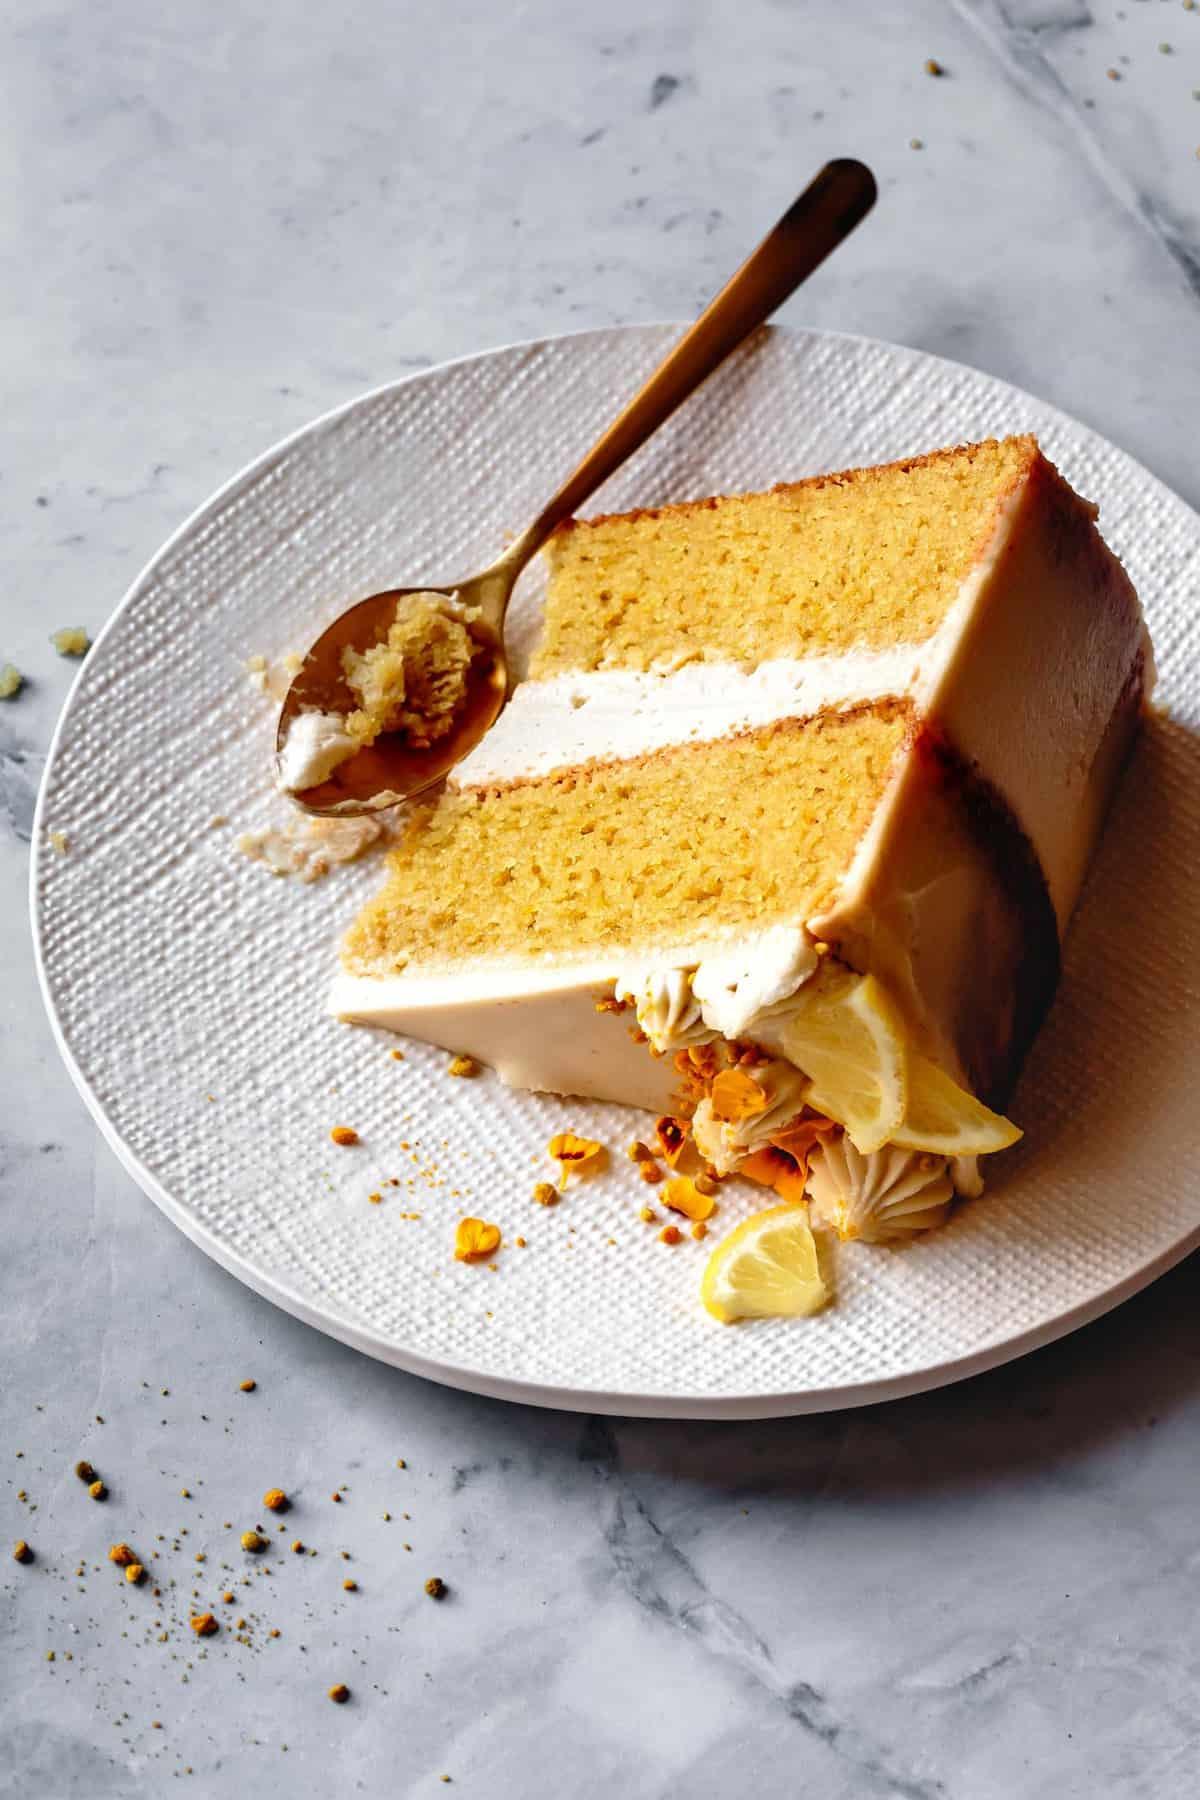 paleo lemon cake slice on a textured white plate on marble